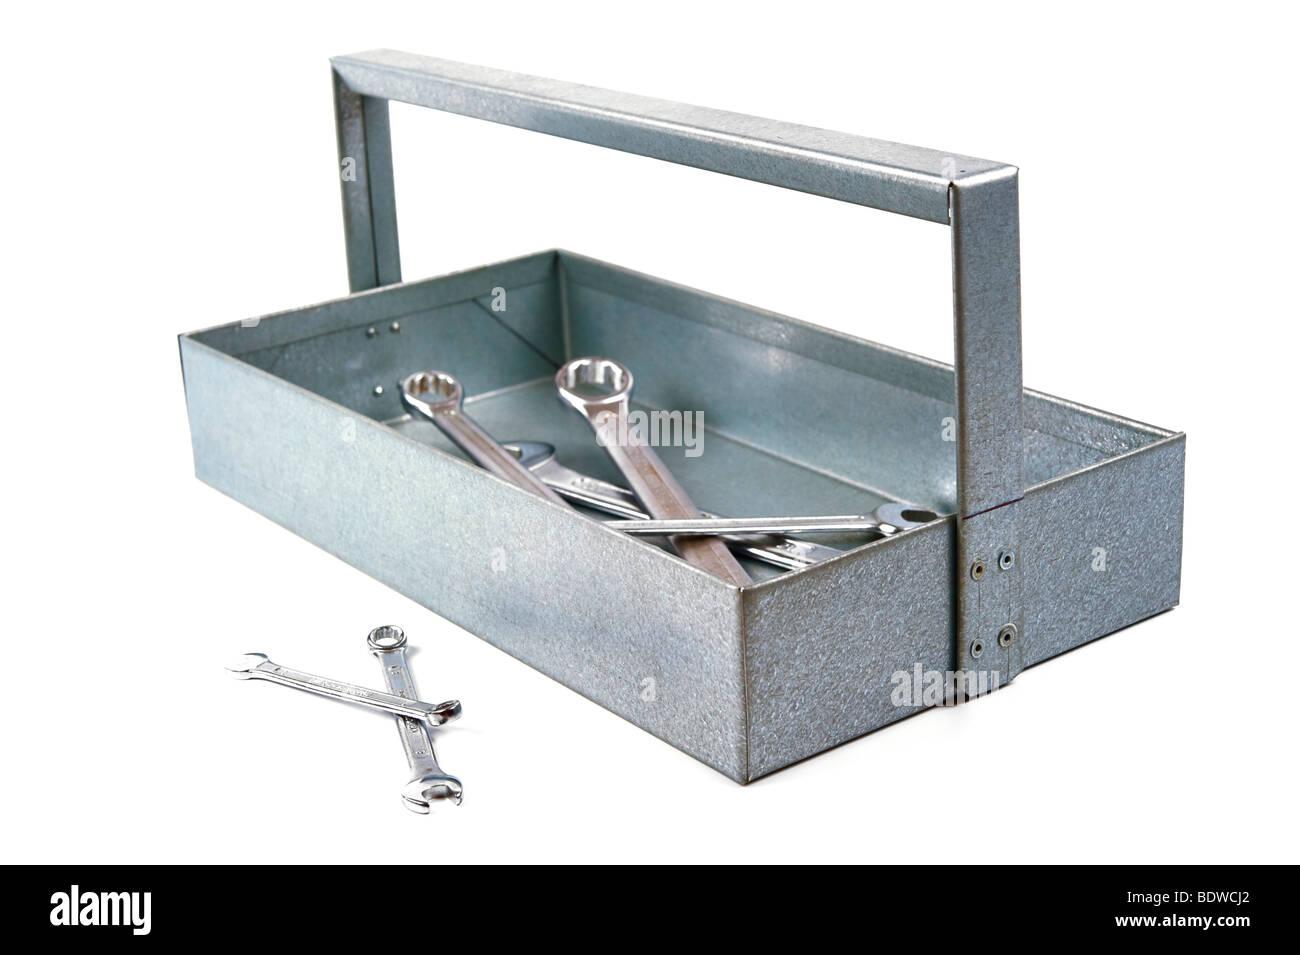 Handmade tool box, apprentice's work, made of galvanized sheet metal - Stock Image